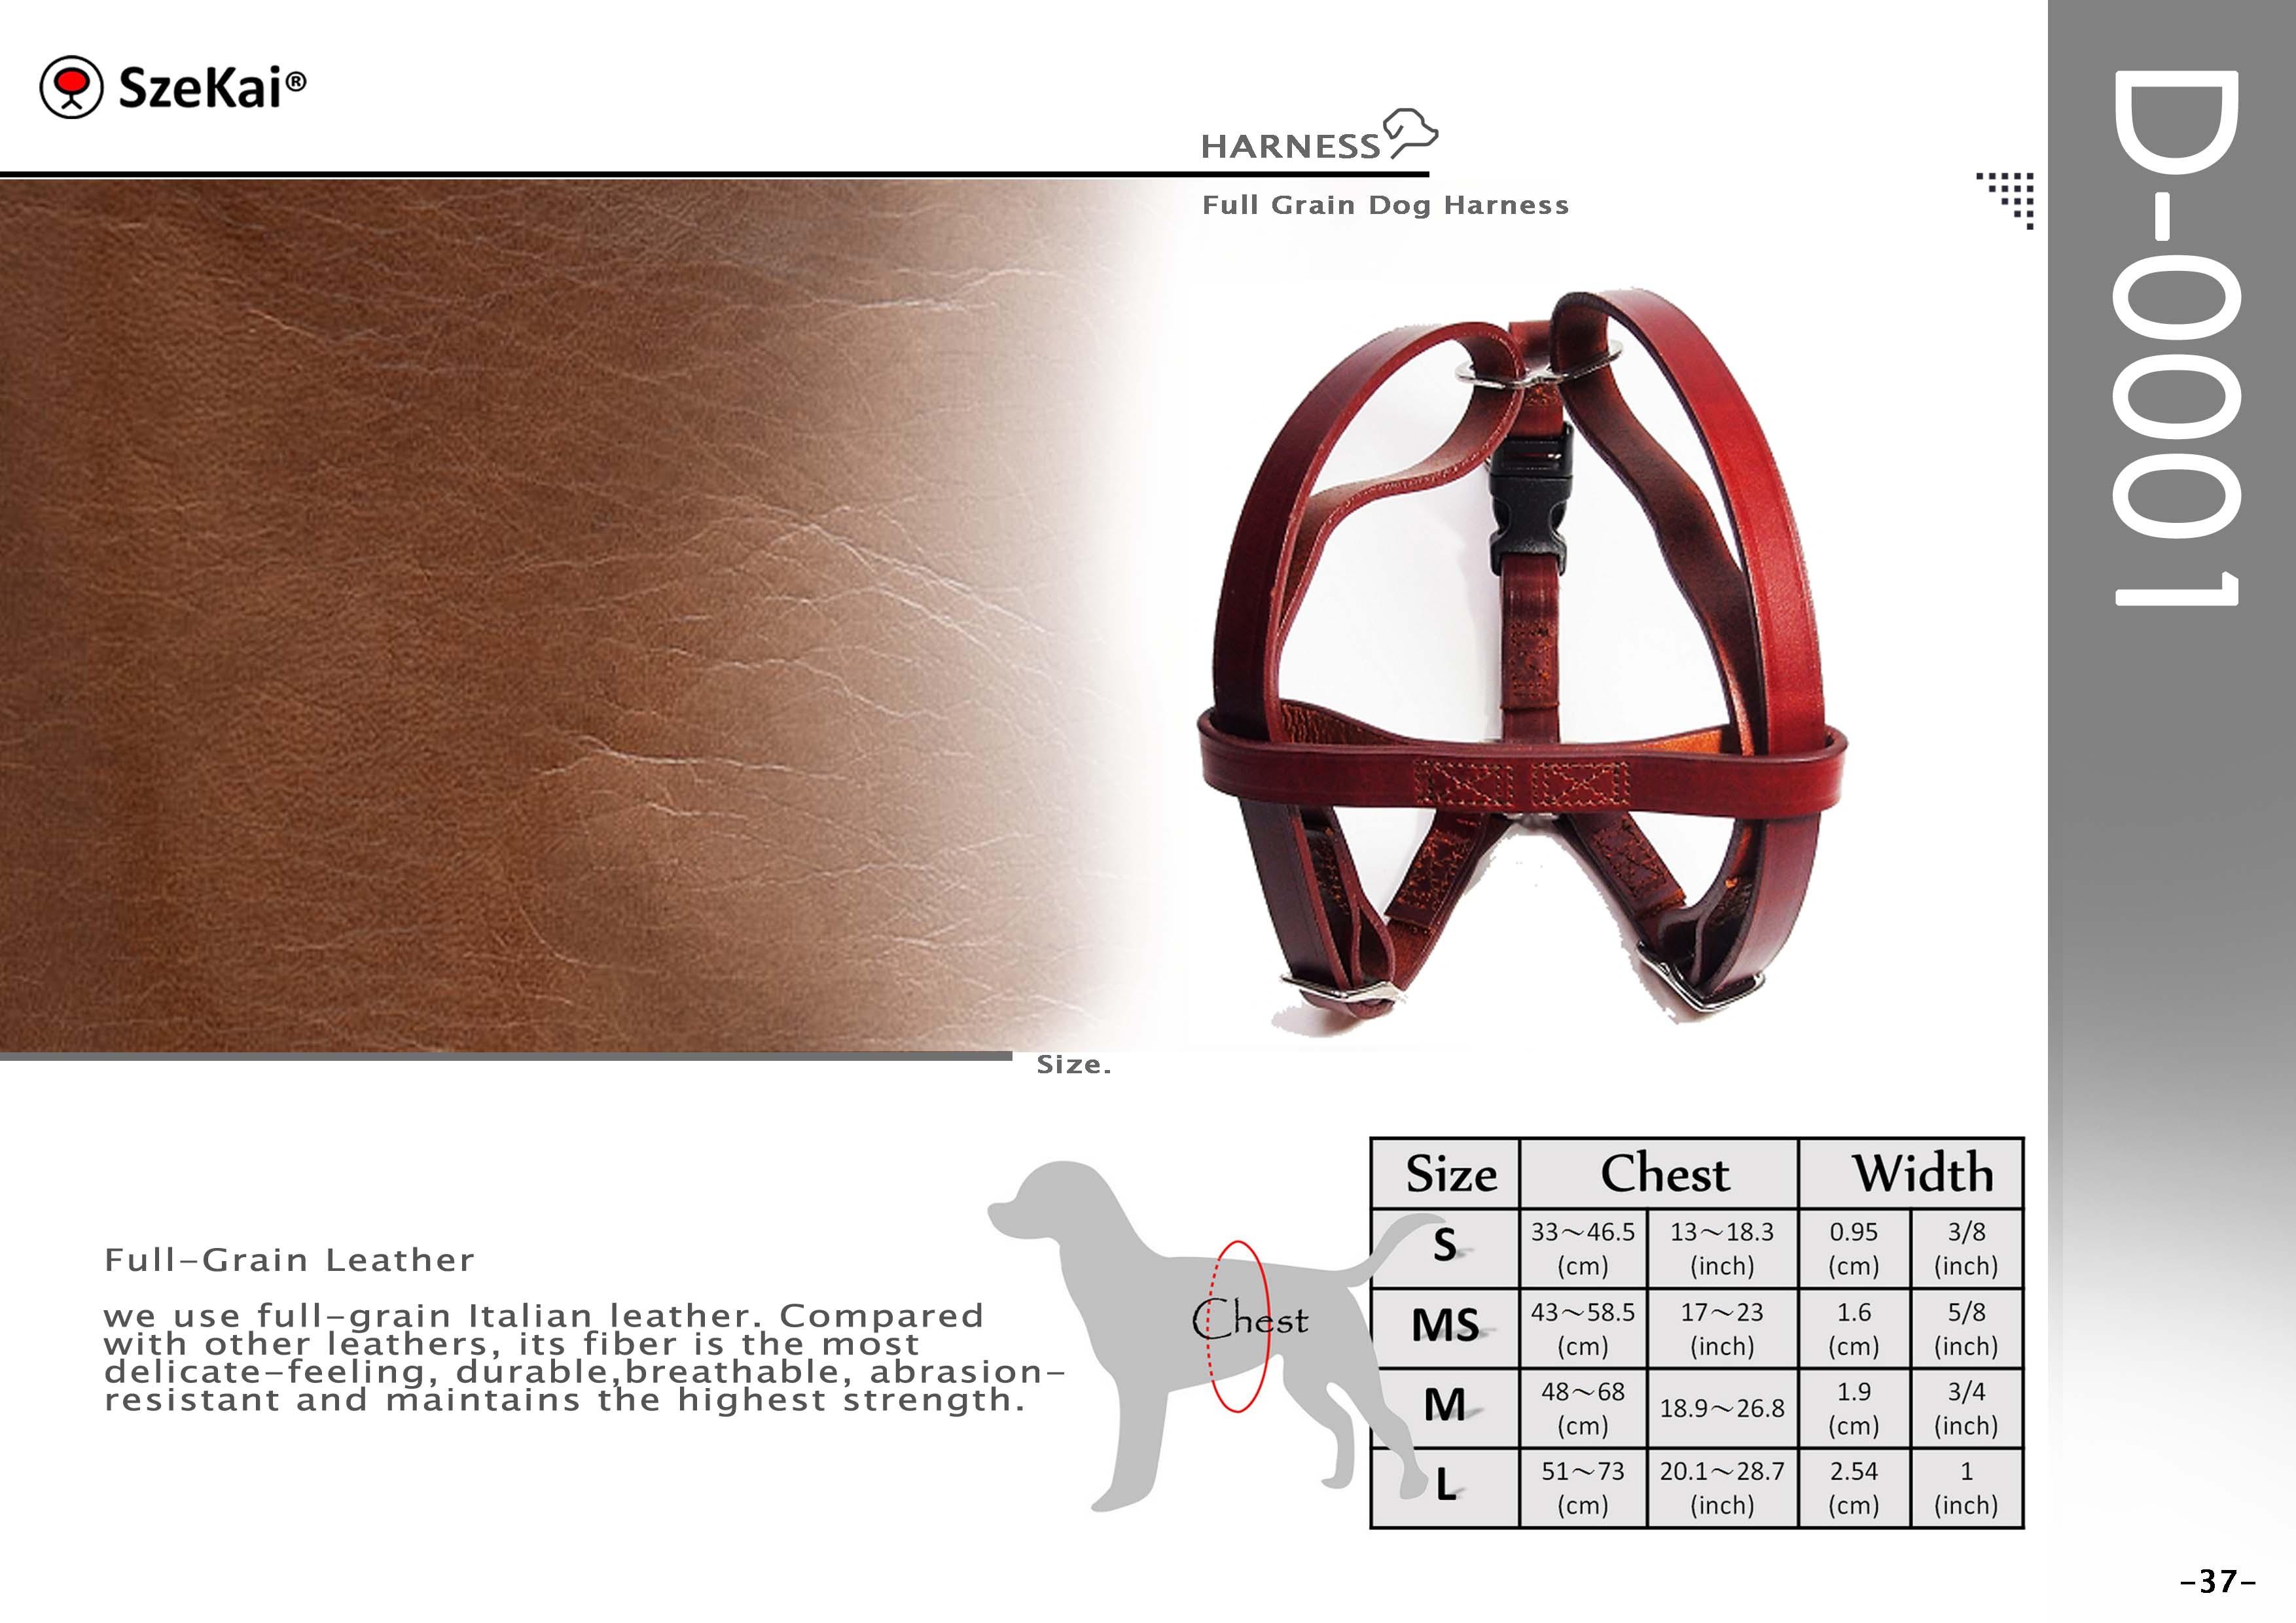 Full-Grain Leather Dog Harness